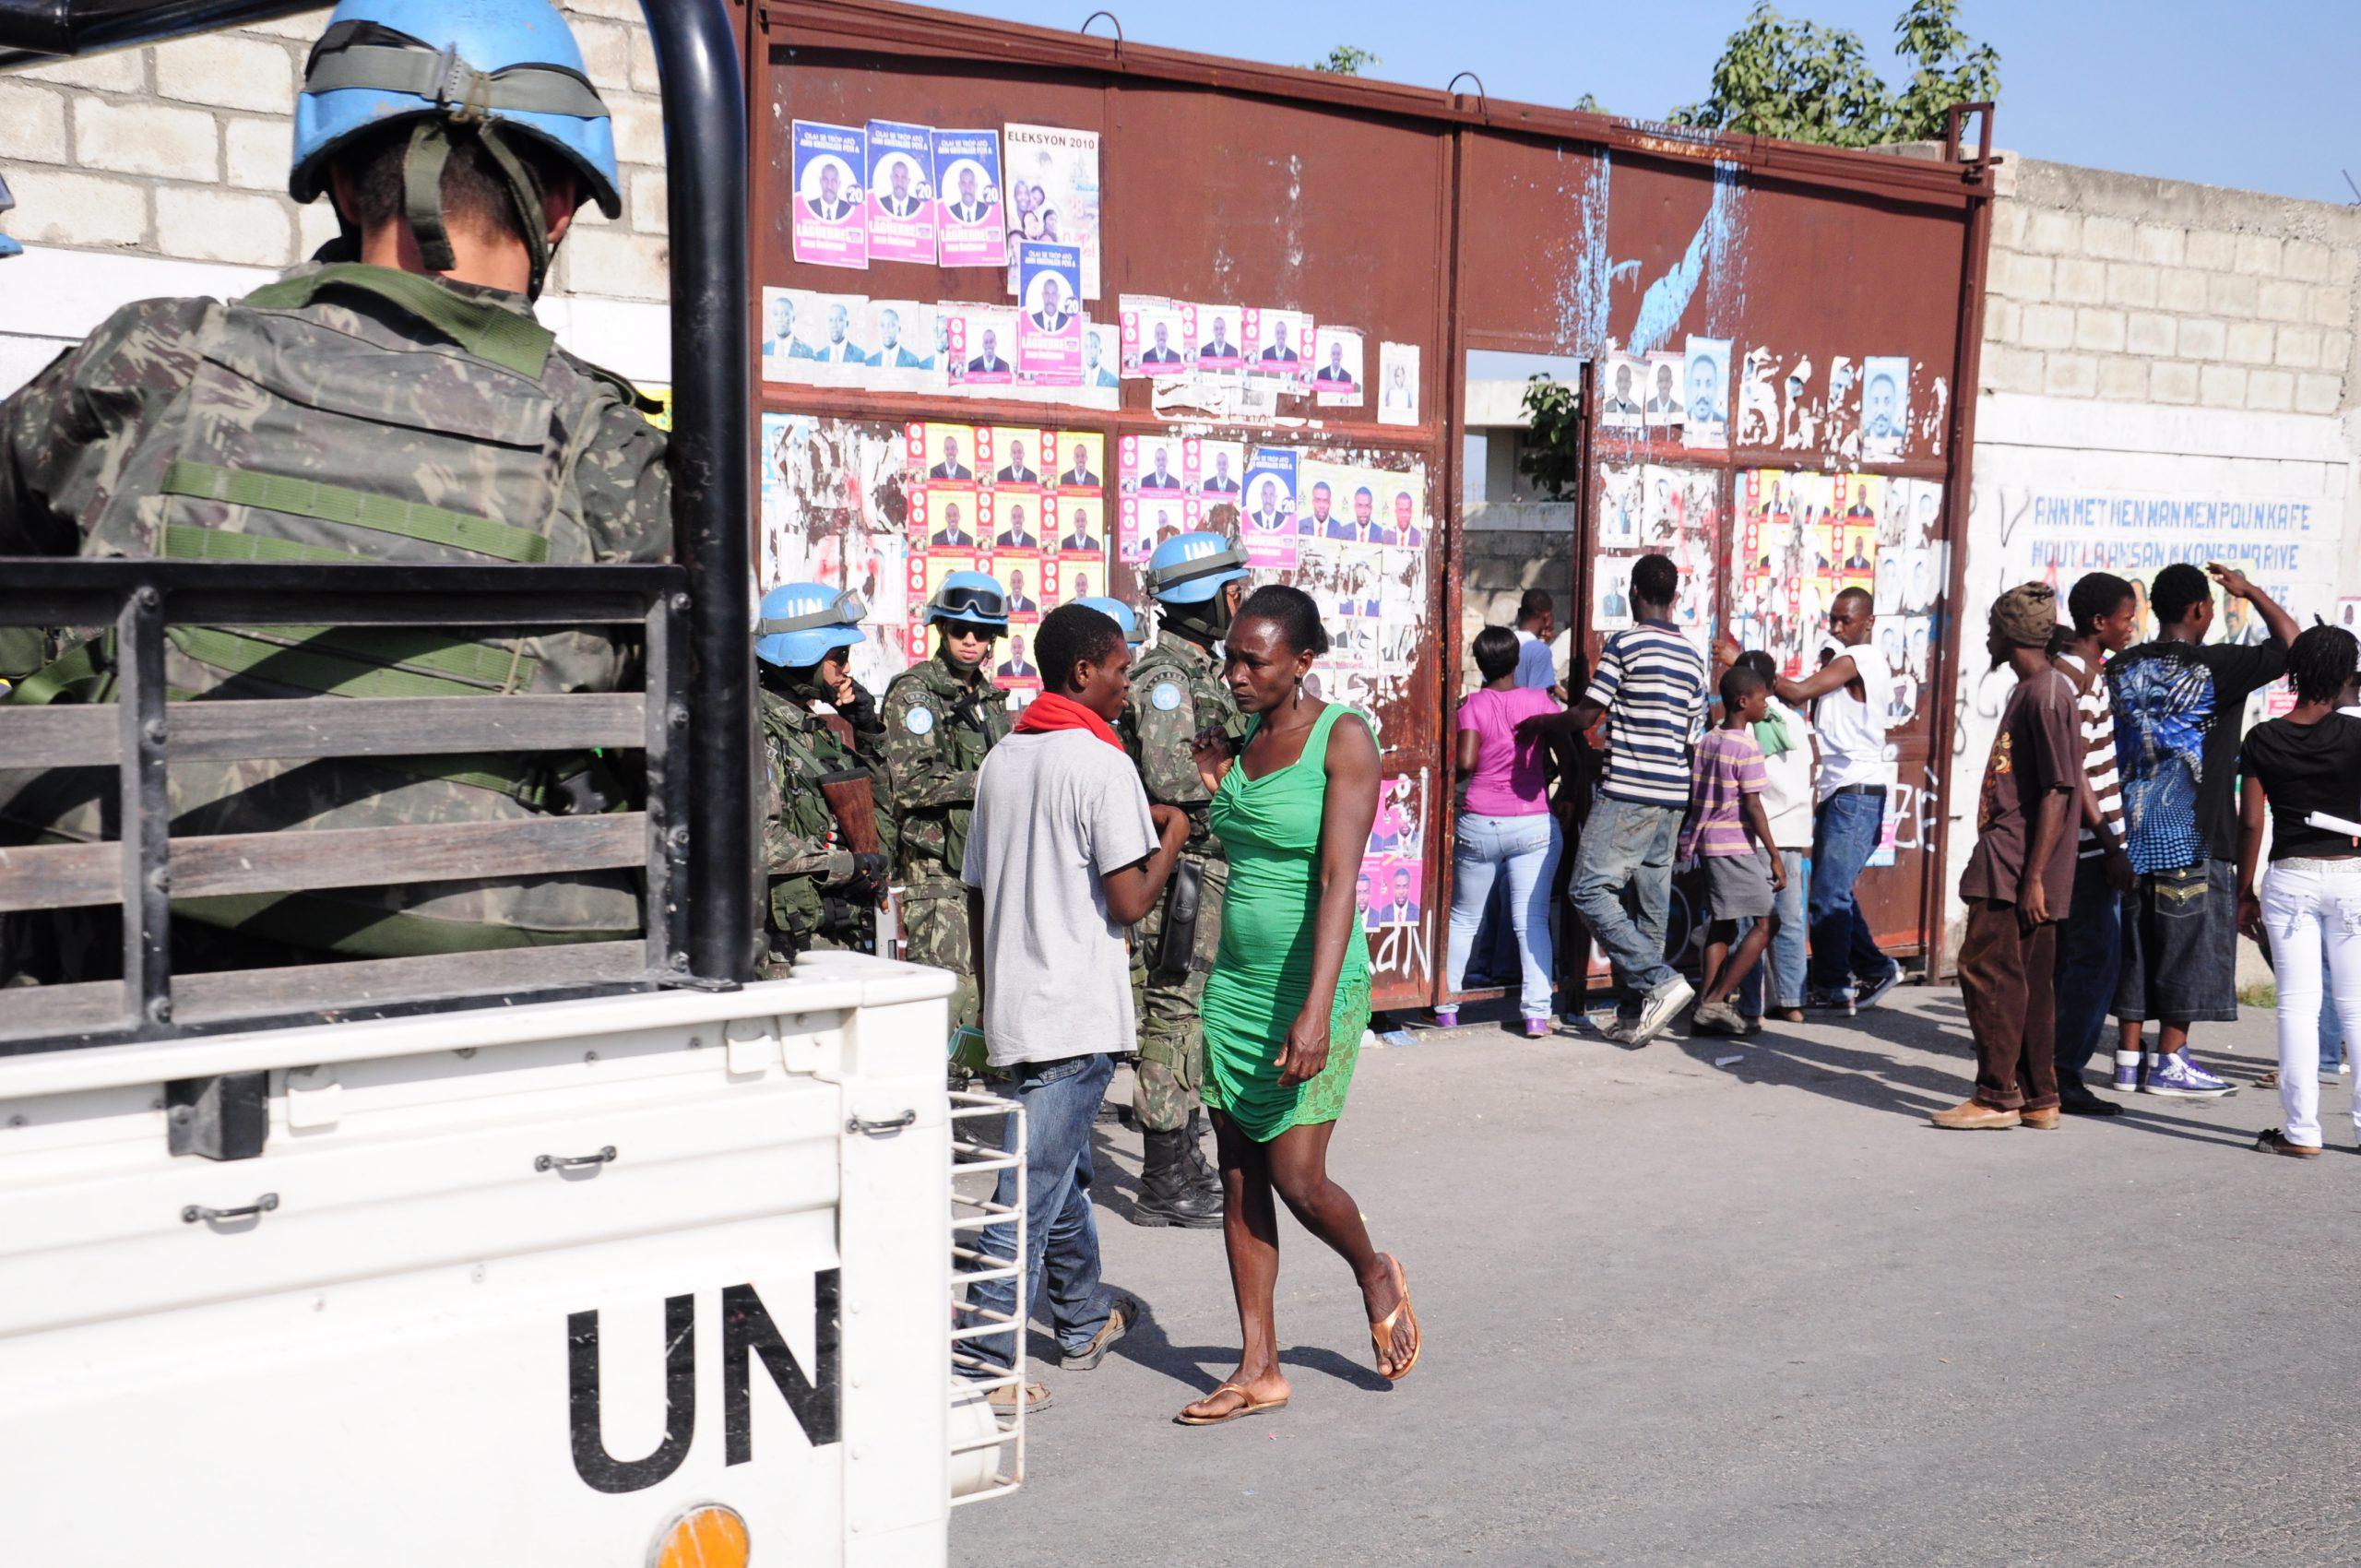 Haiti Third in Global Hunger Index